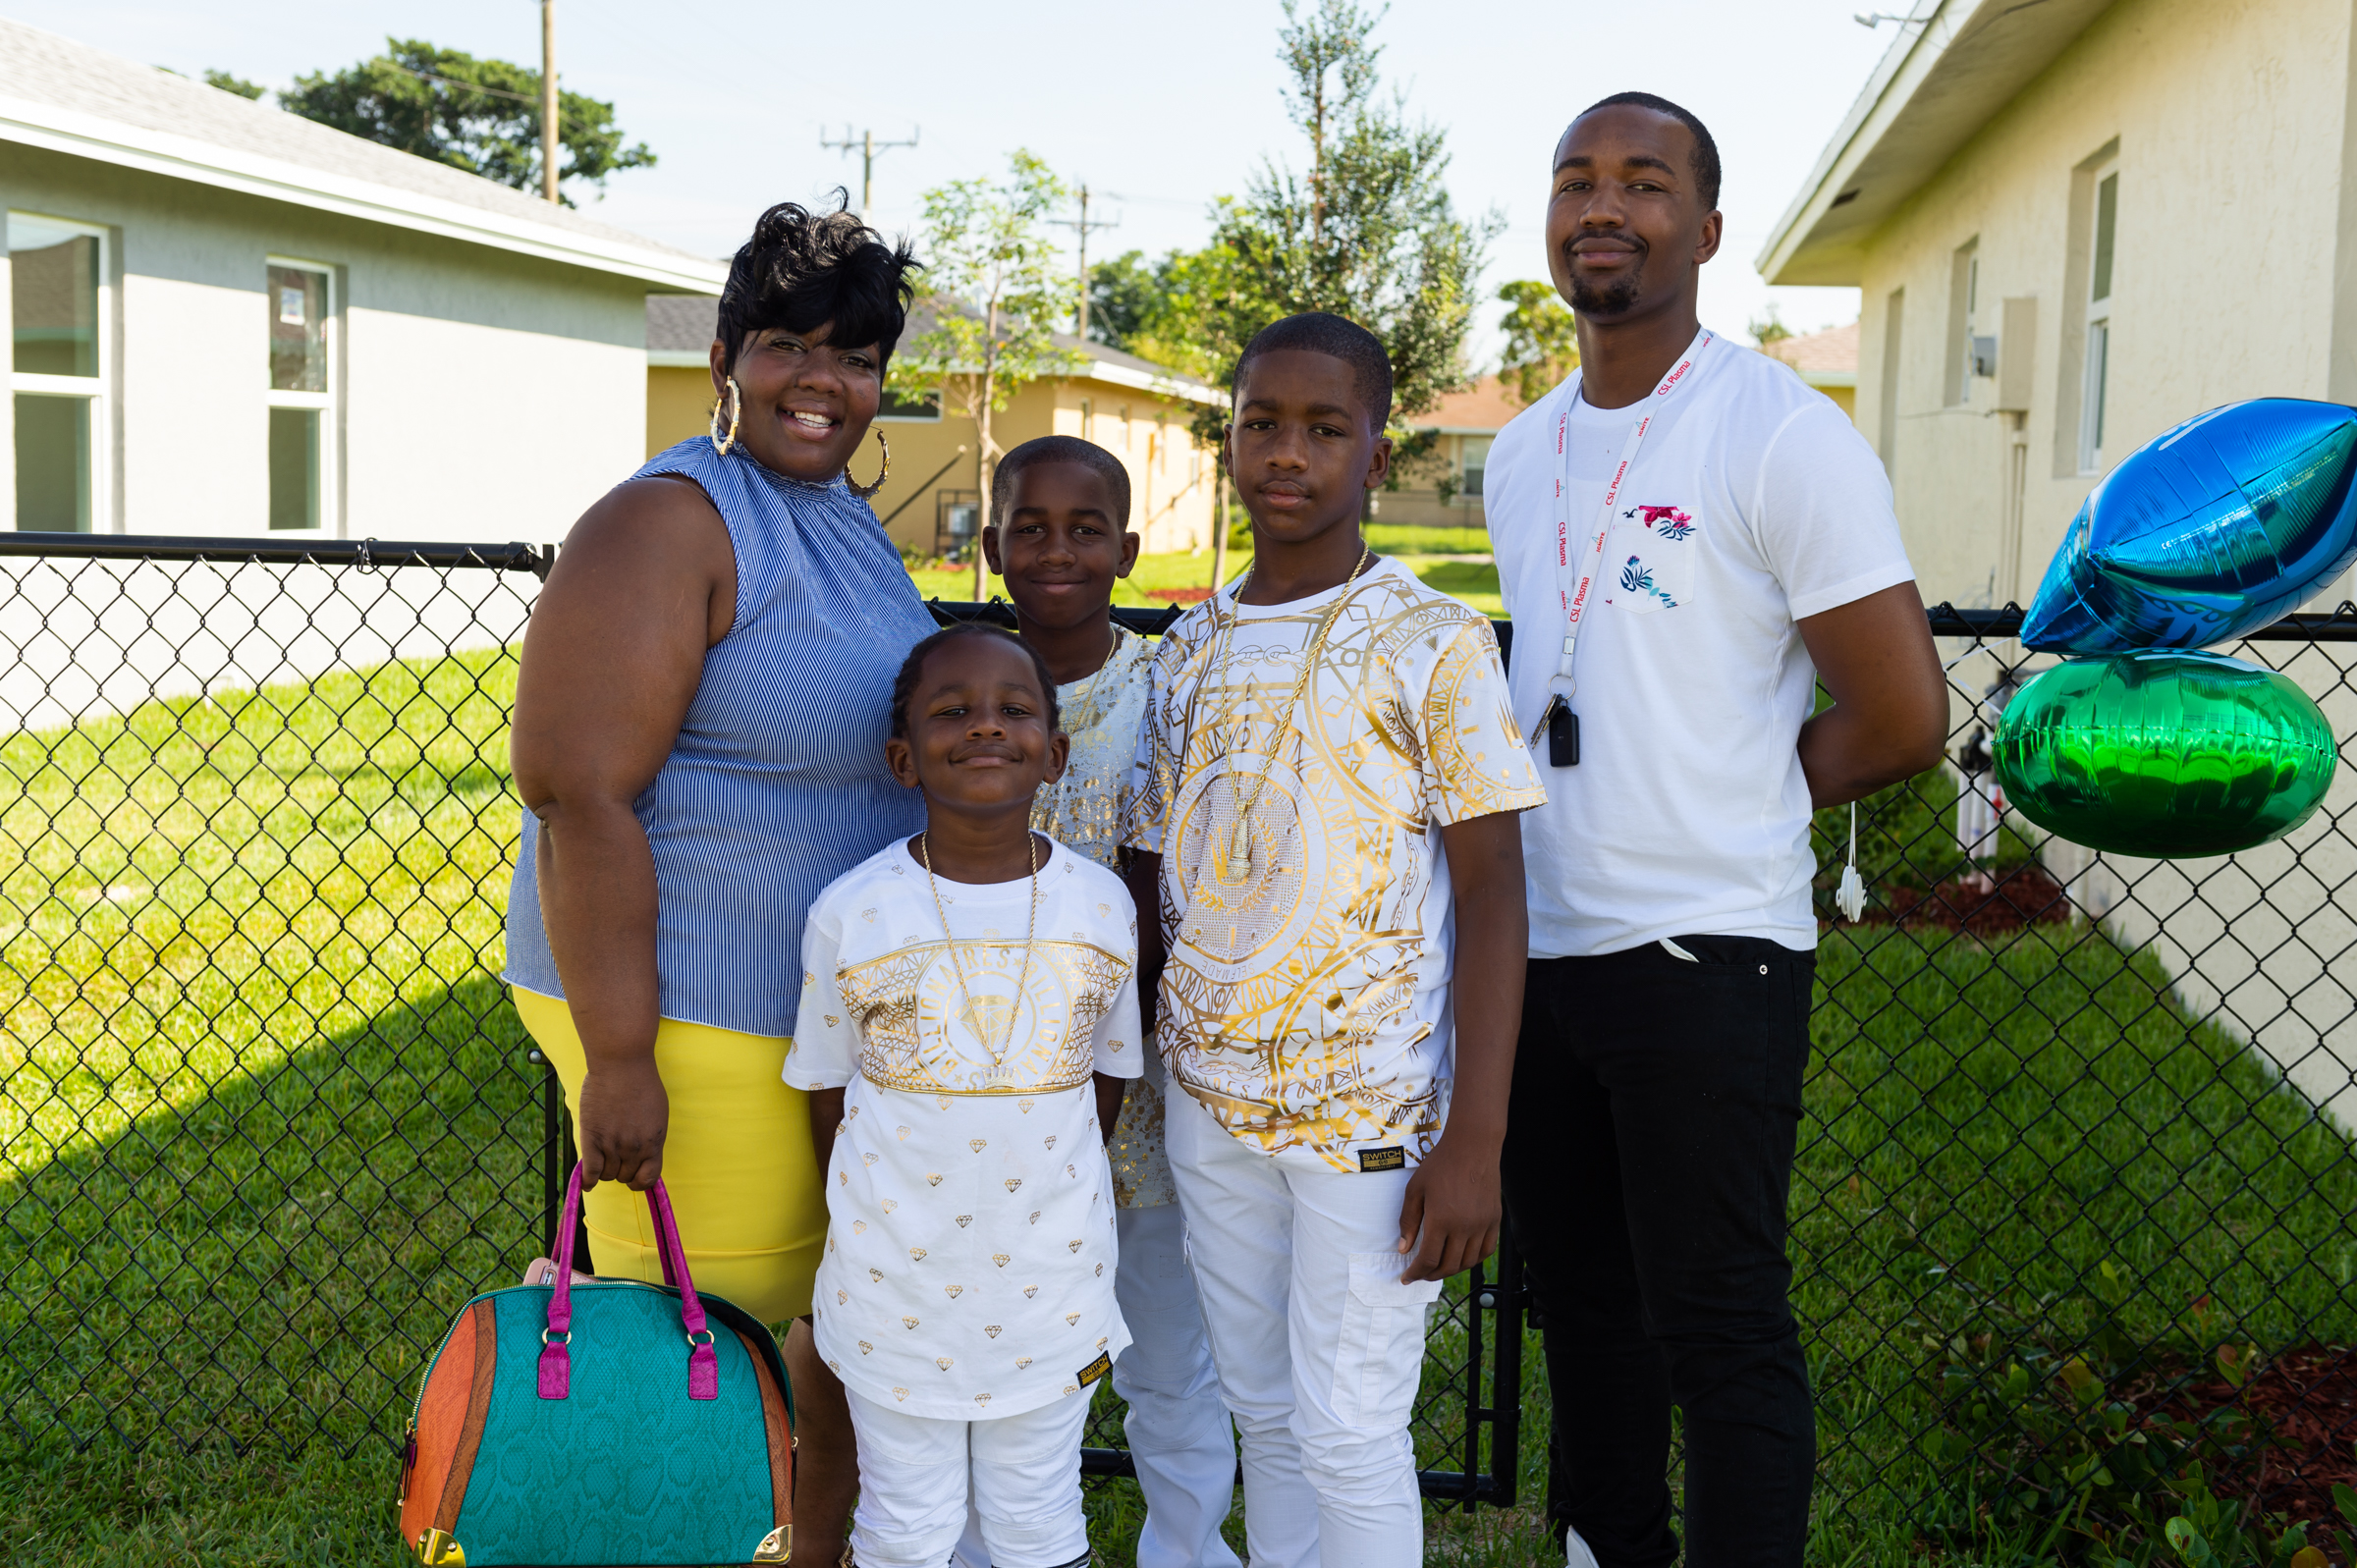 image_Karnese Wring family